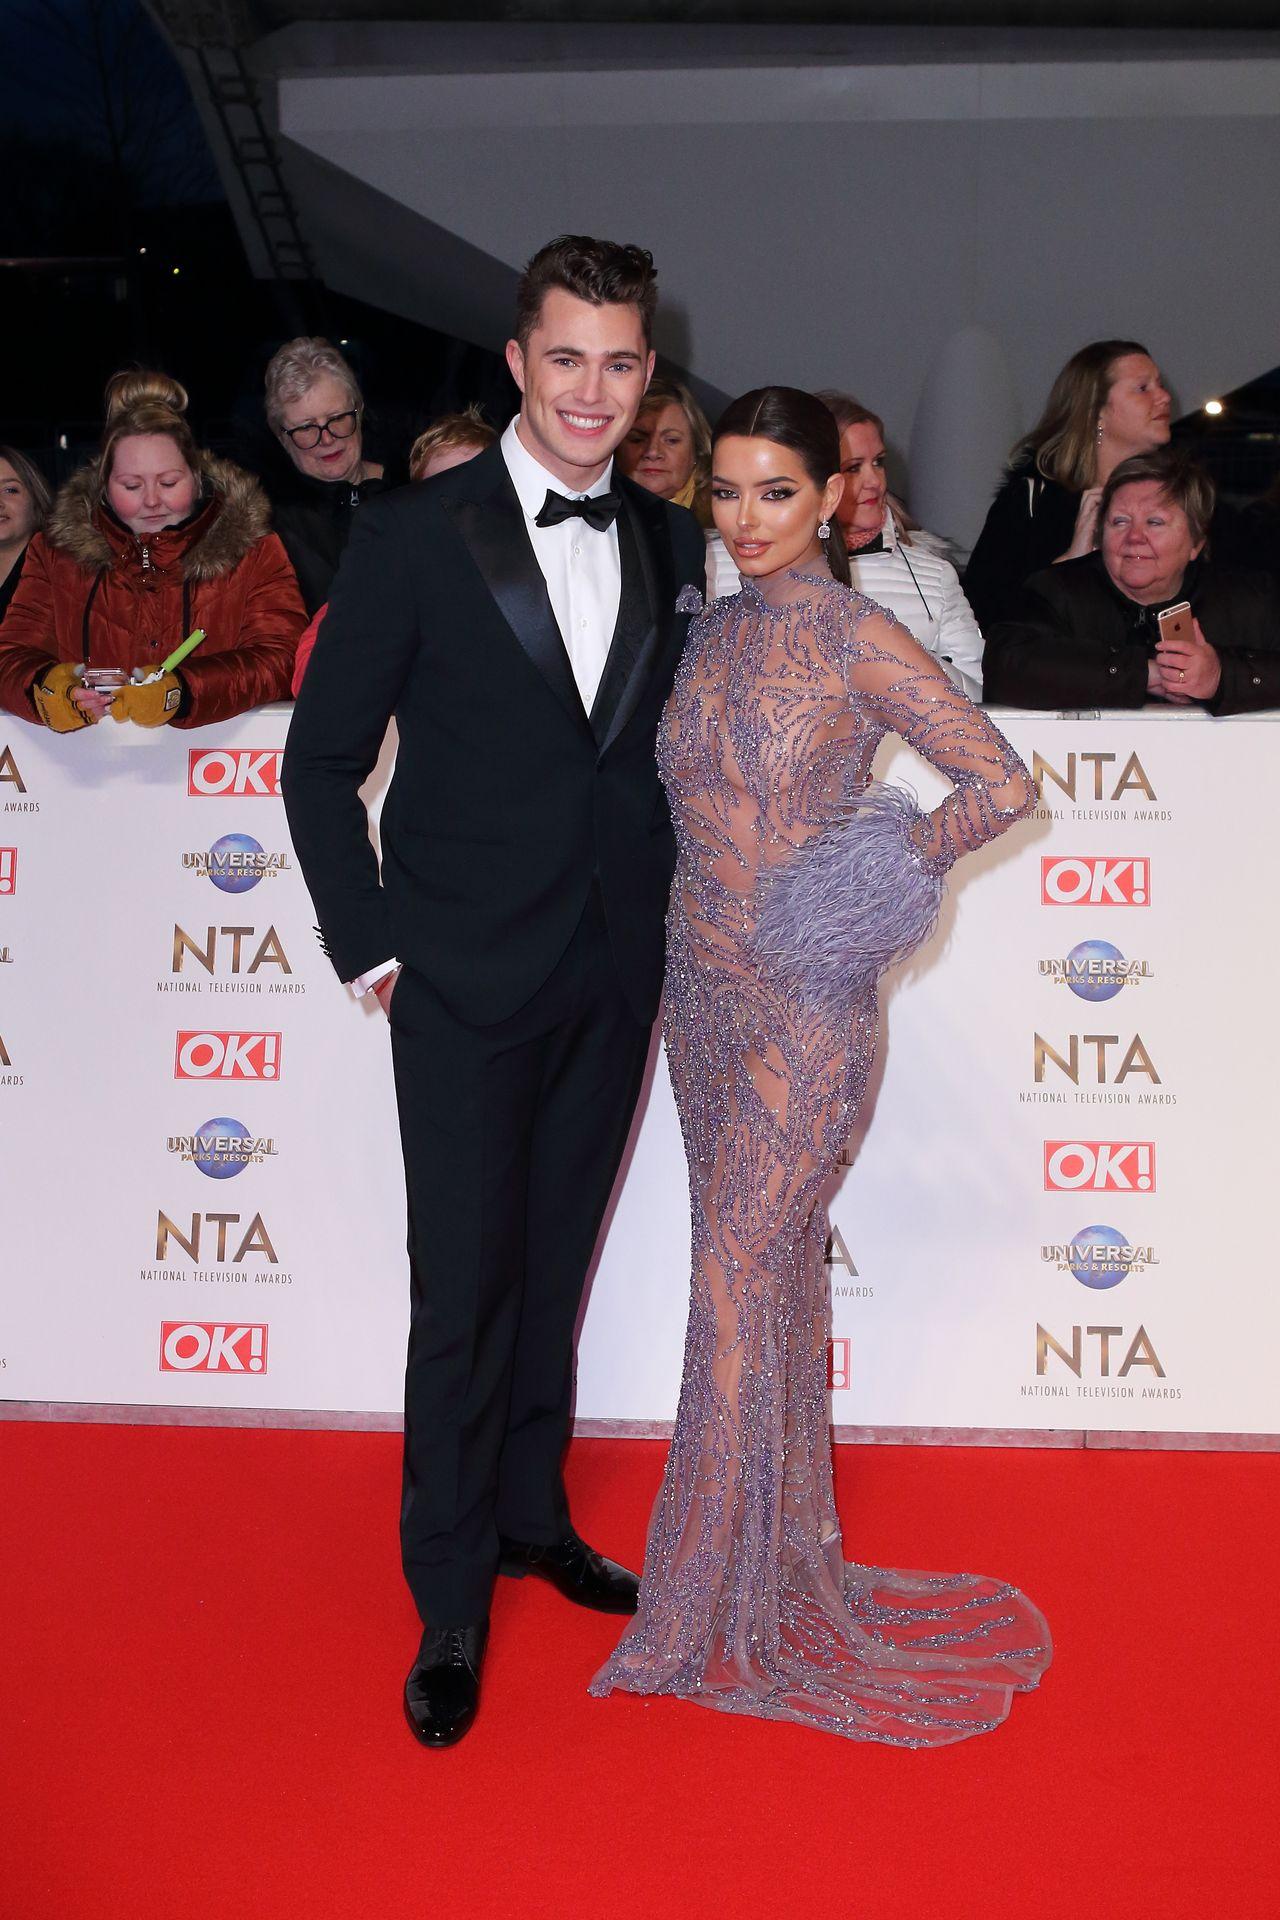 Maura Higgins Looks Hot At The National Television Awards 0013